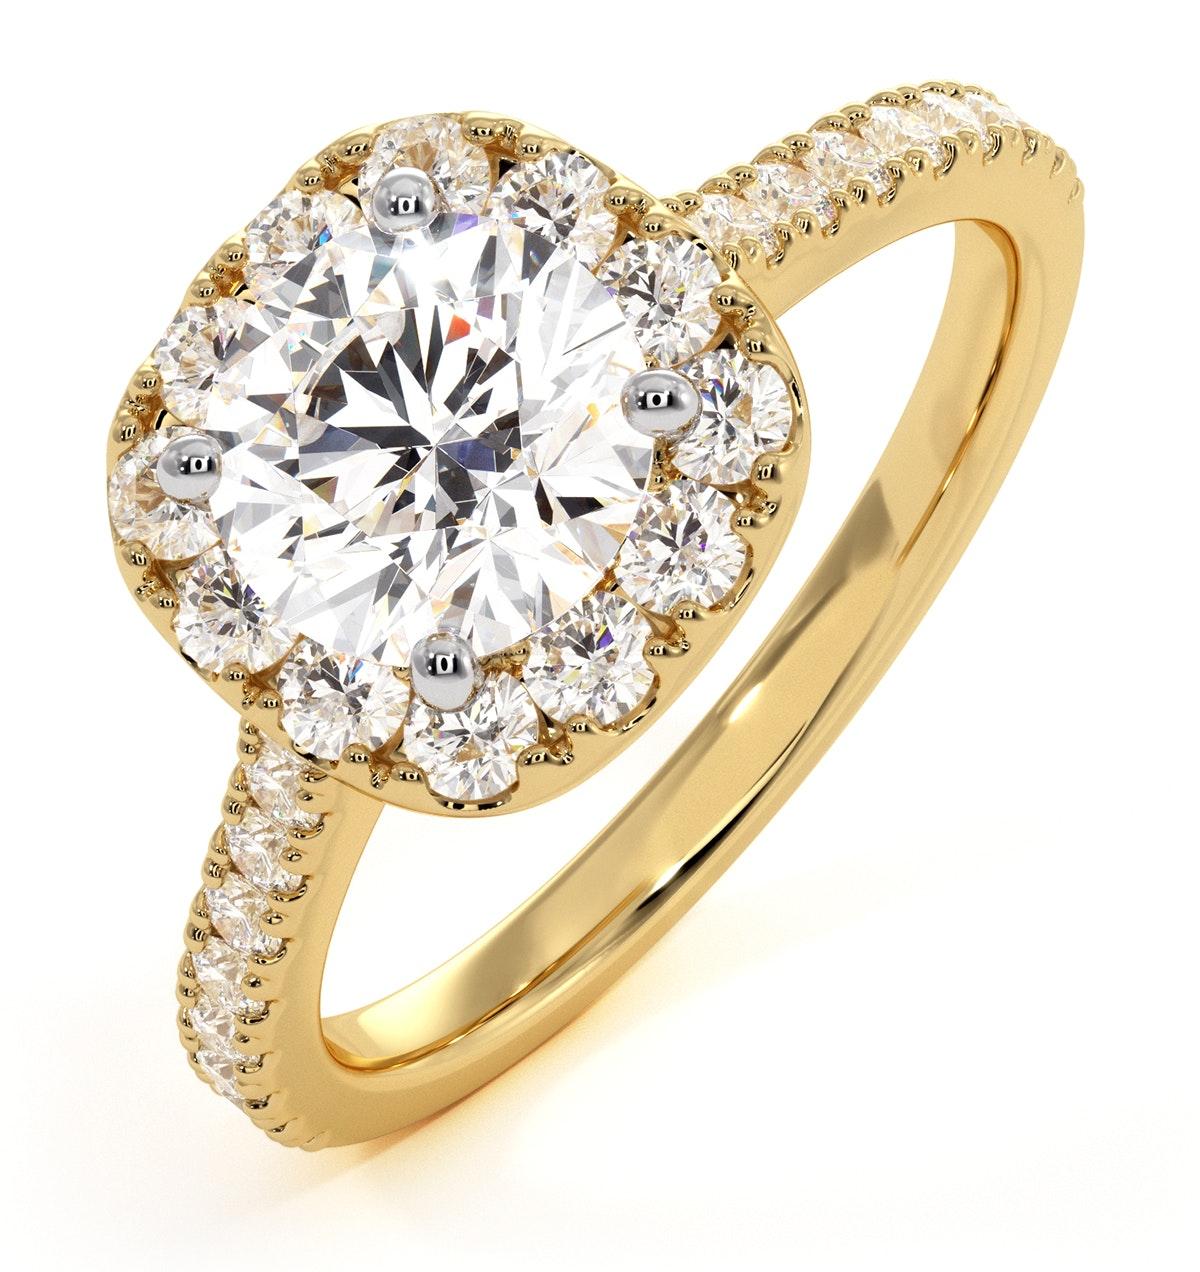 Elizabeth GIA Diamond Halo Engagement Ring in 18K Gold 1.70ct G/VS2